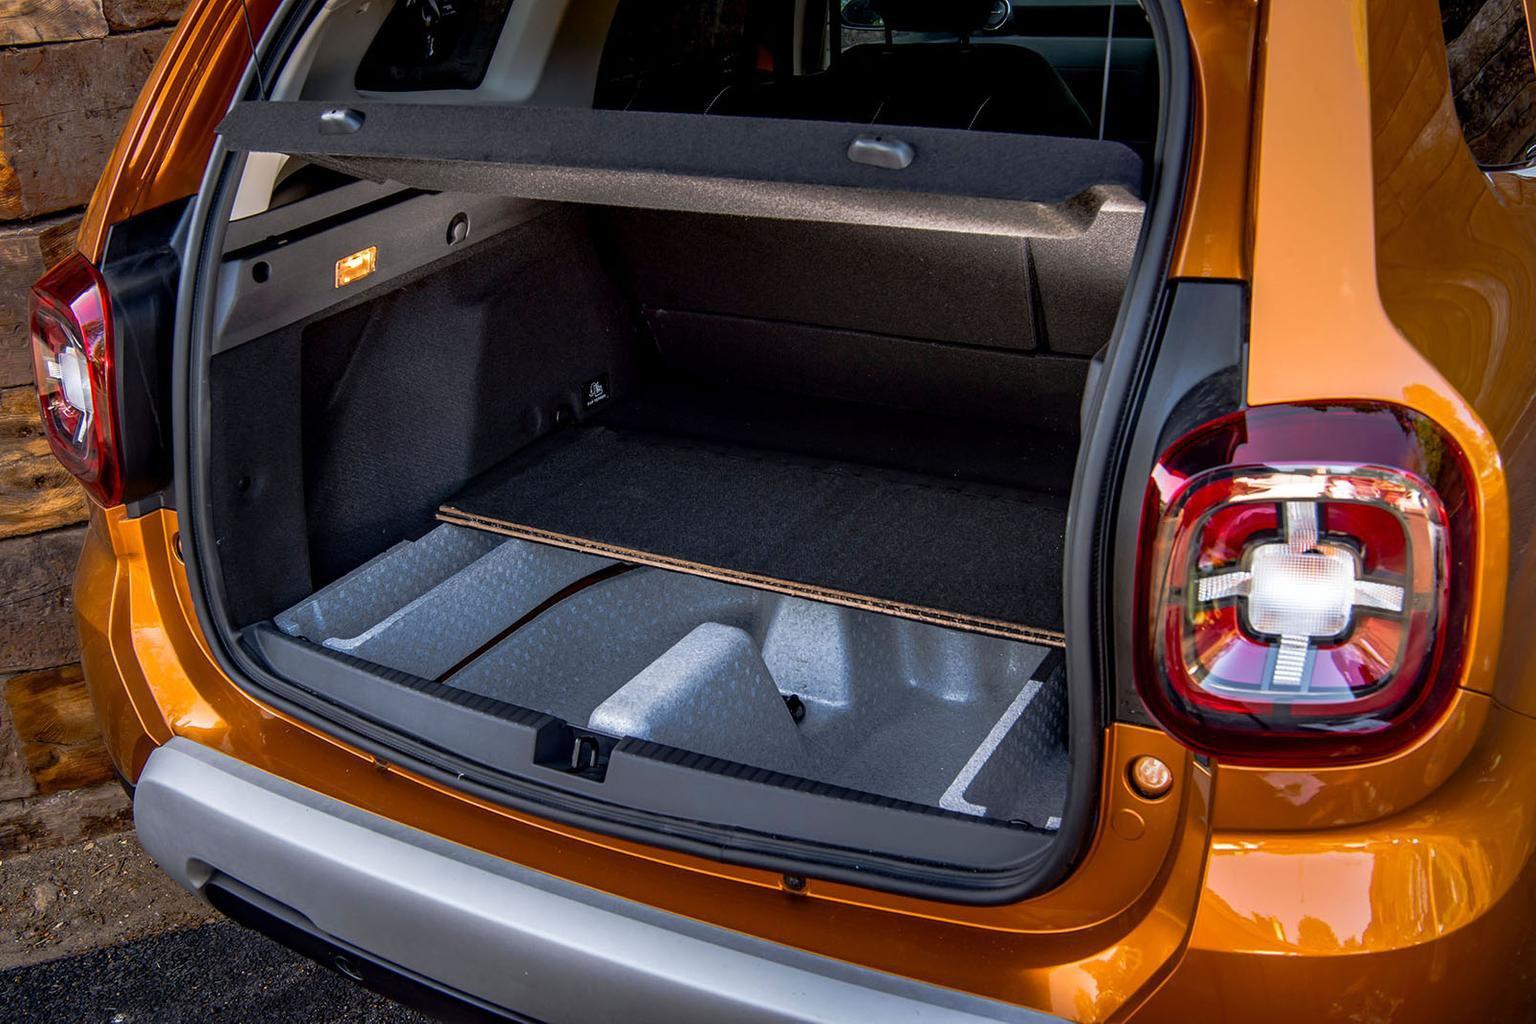 Dacia Duster 2020 boot